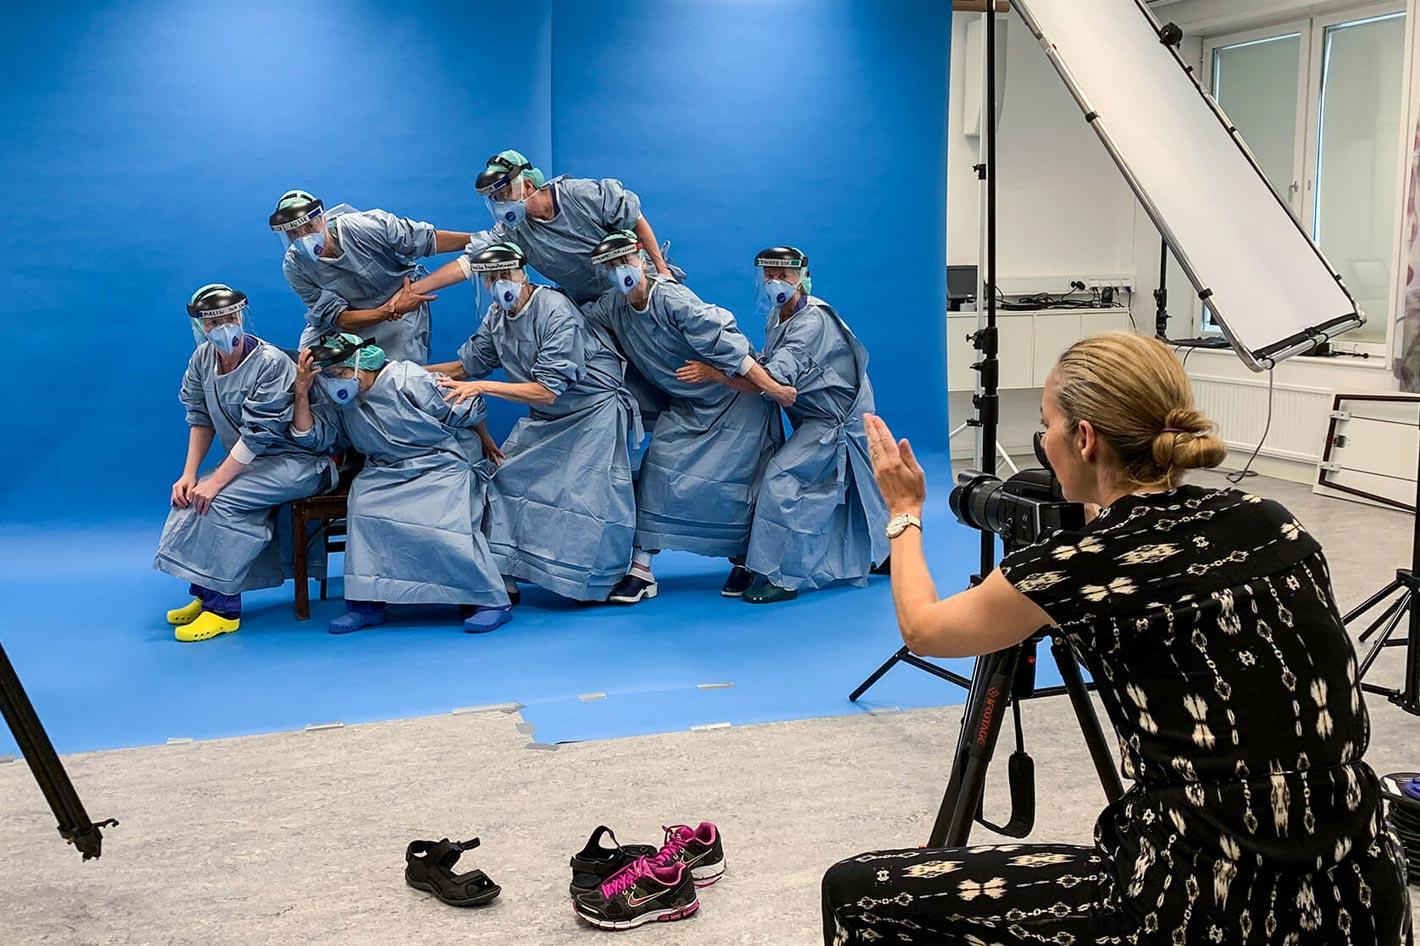 Cooper & Gorfer's Delirium: using art to capture a pandemic